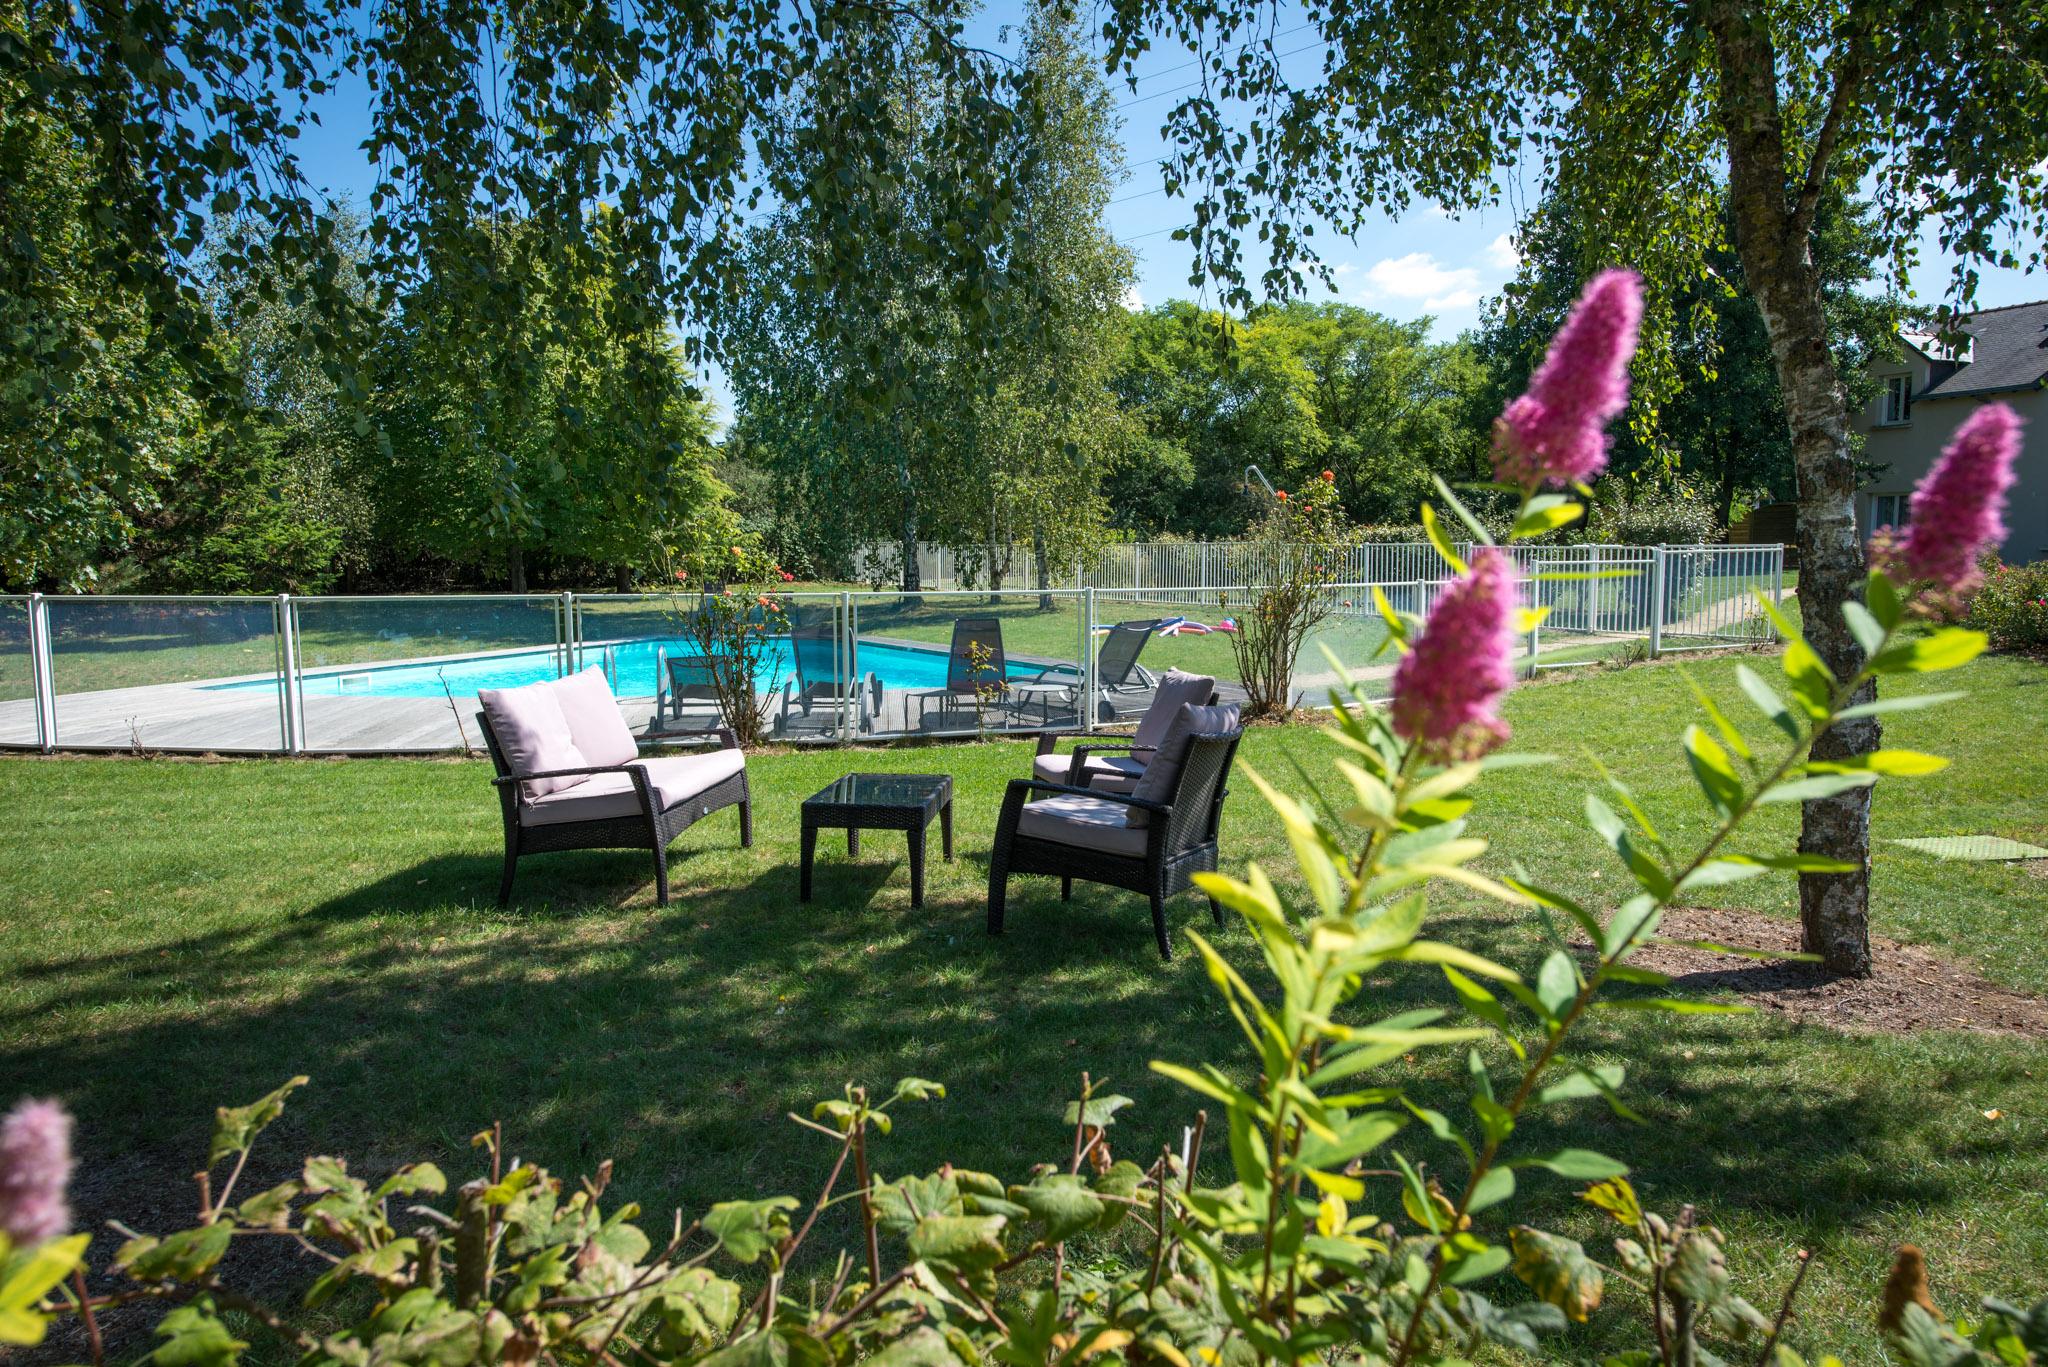 Doué-la-fontaine hotels near Saumur and Angers